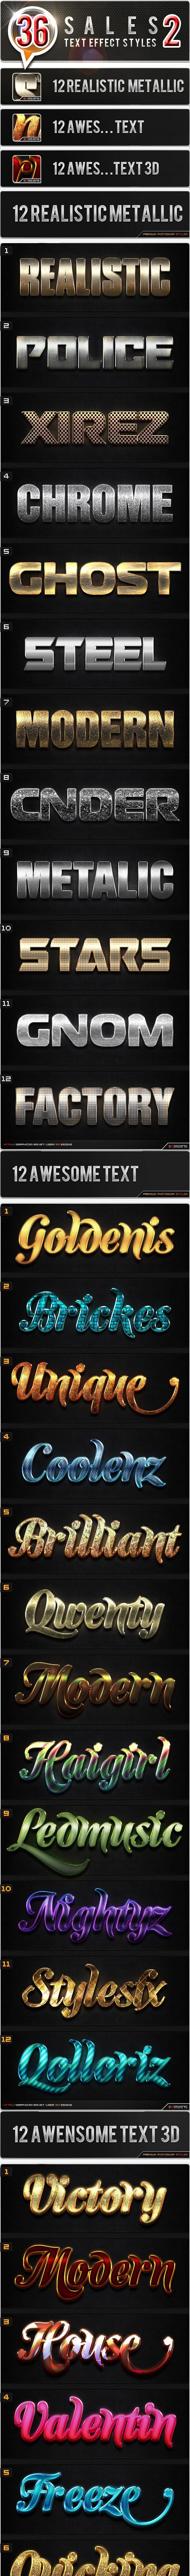 36 Sales 2 Bundle - Text Effects Styles